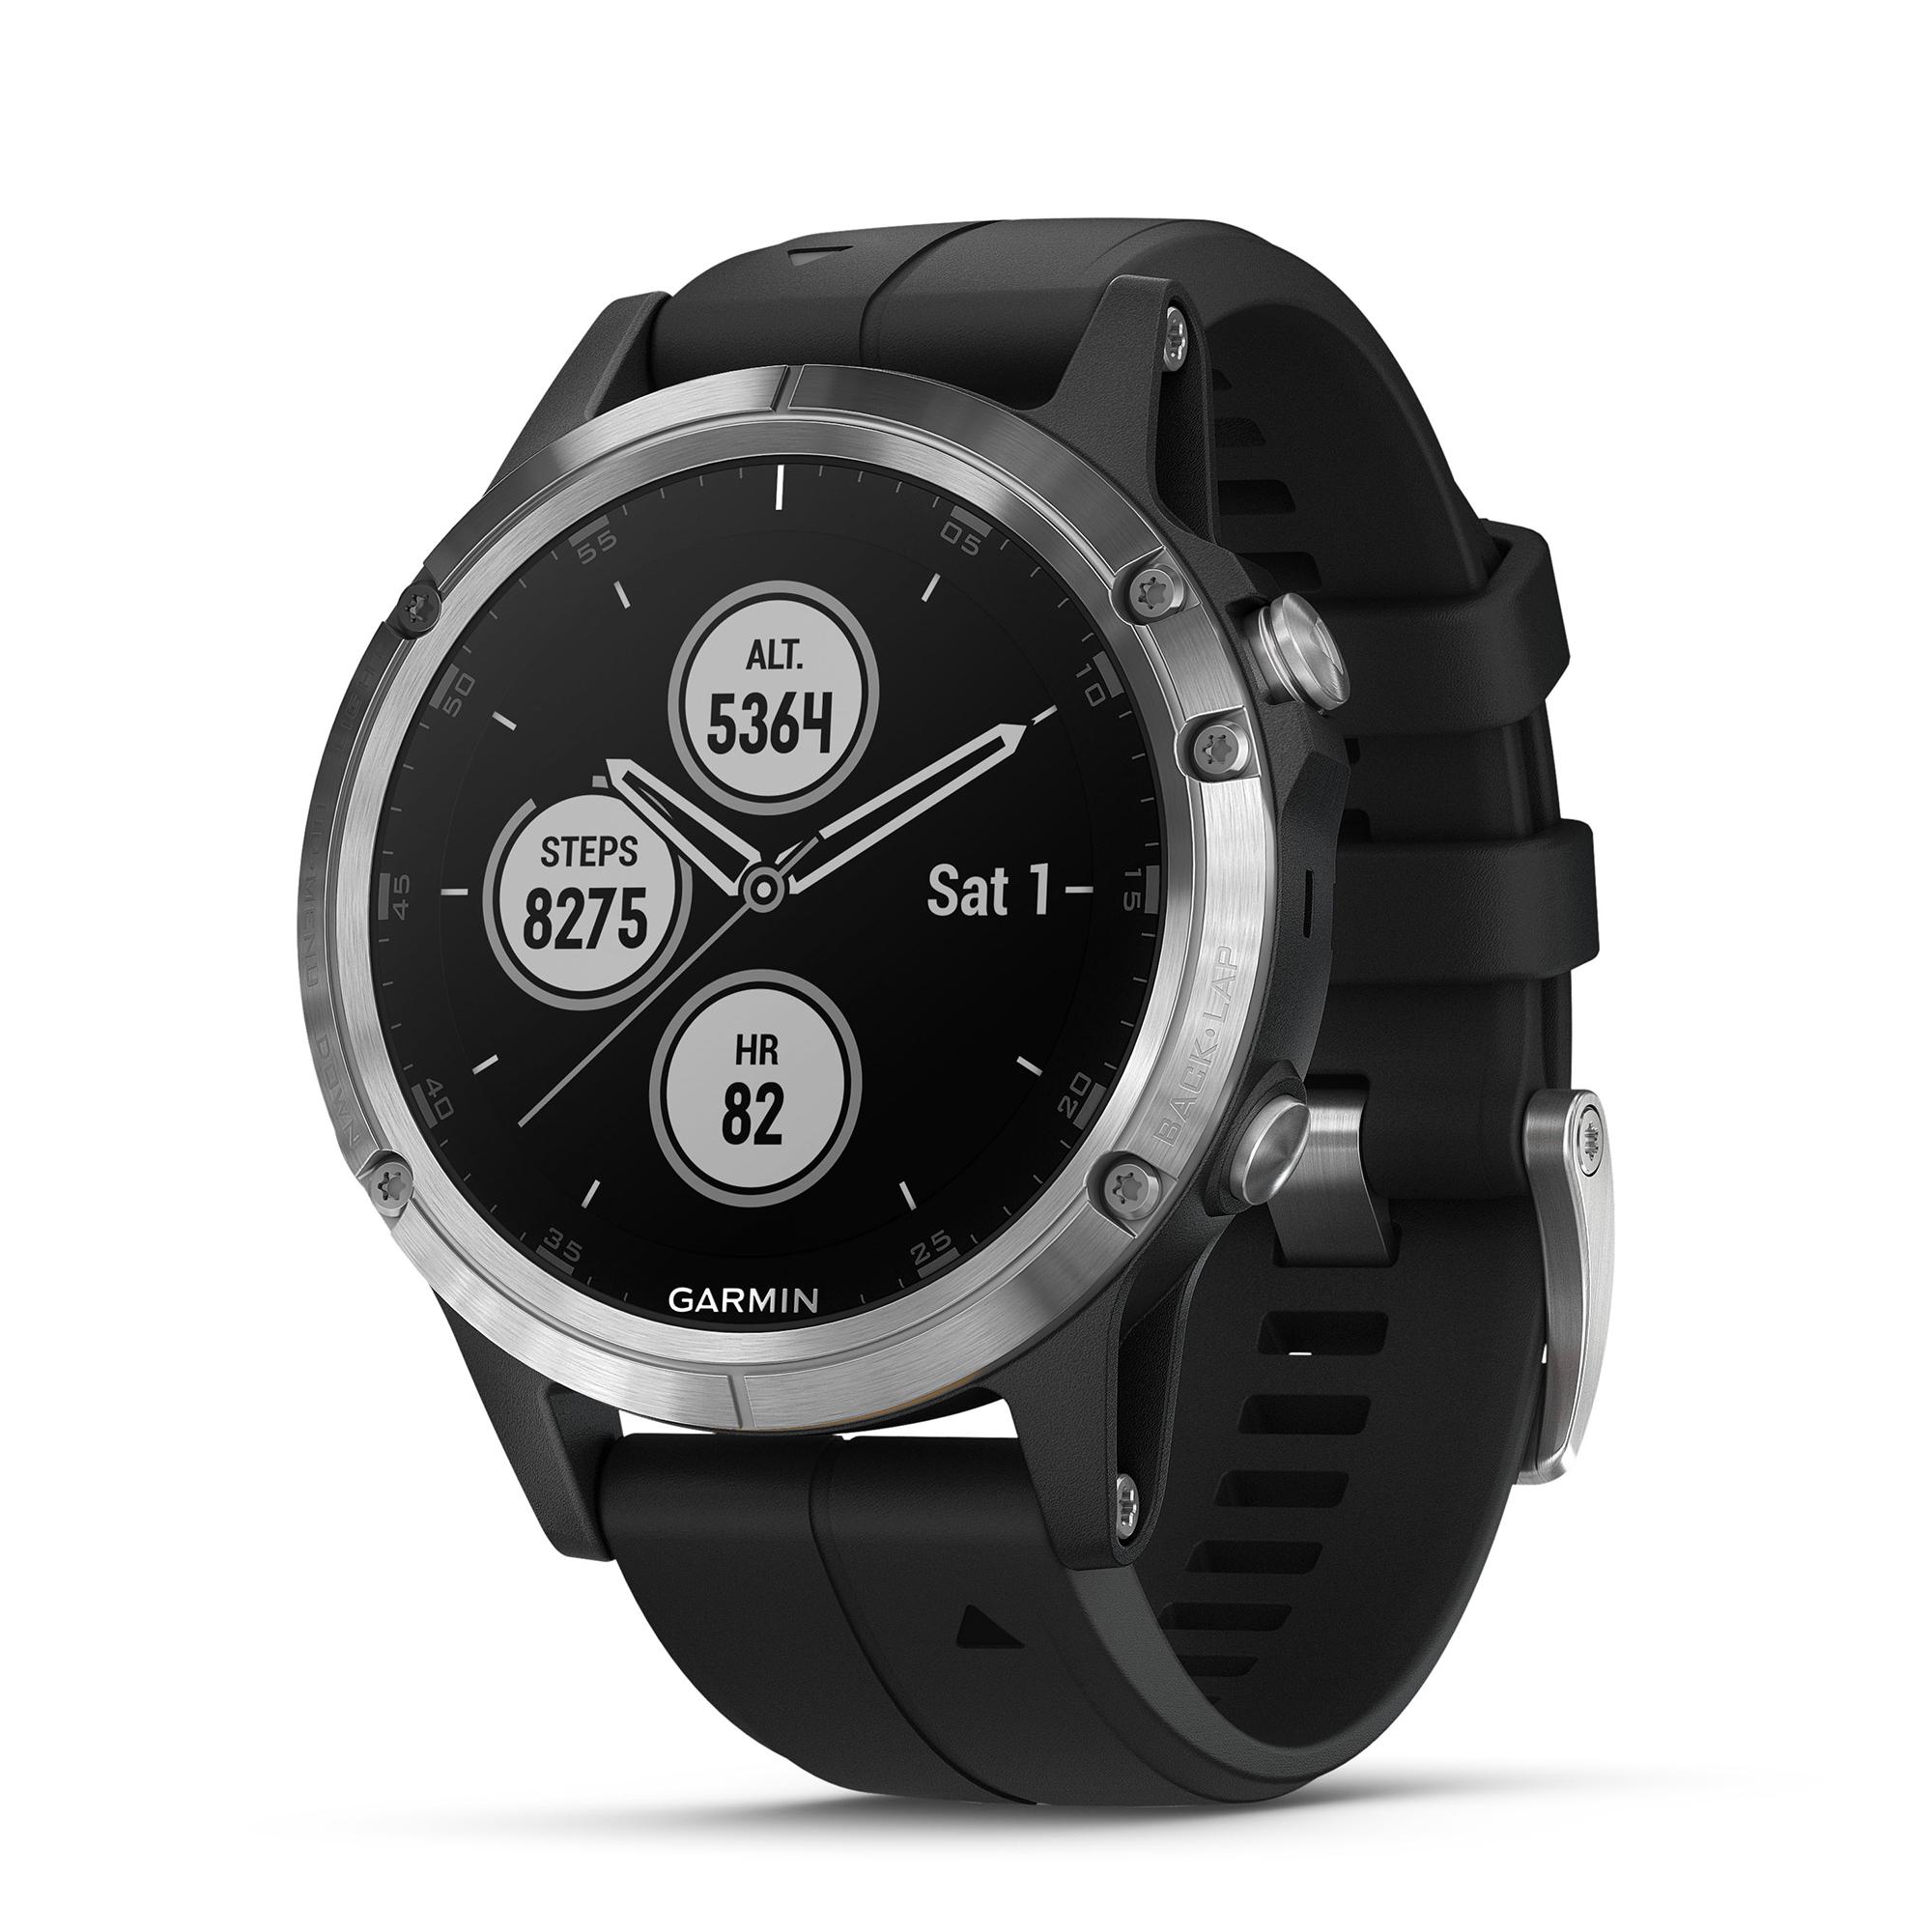 Details about Garmin fenix 5 Plus 47mm Glass Multisport GPS Watch  Silver/Black Band